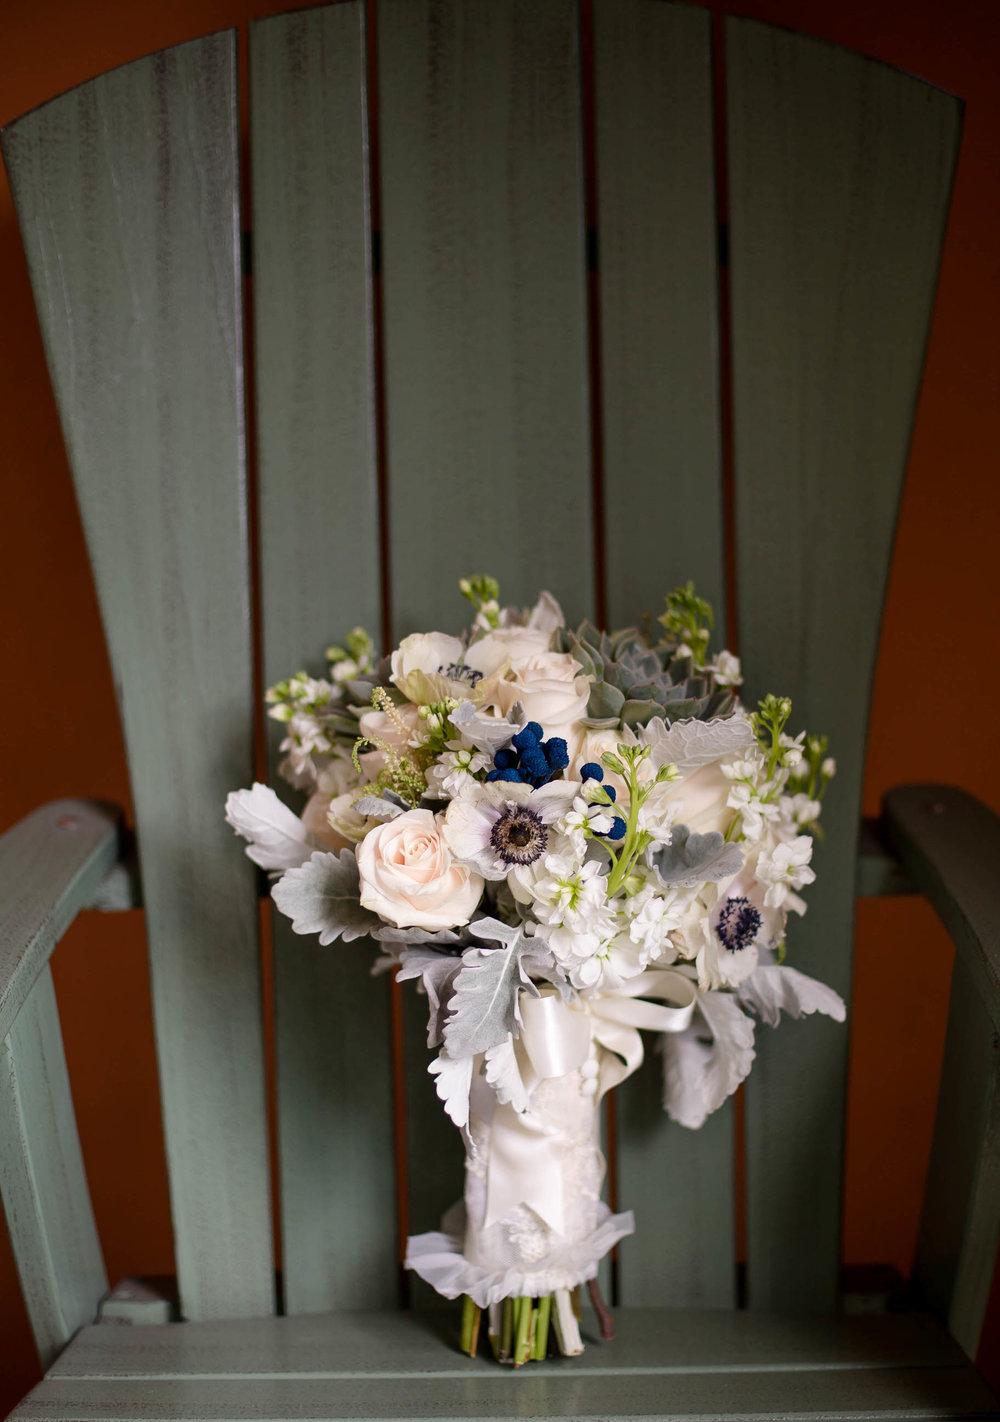 bridal_bouquet_wedding_details_tiny_house_photo_stephanie_lynn_photography.jpg